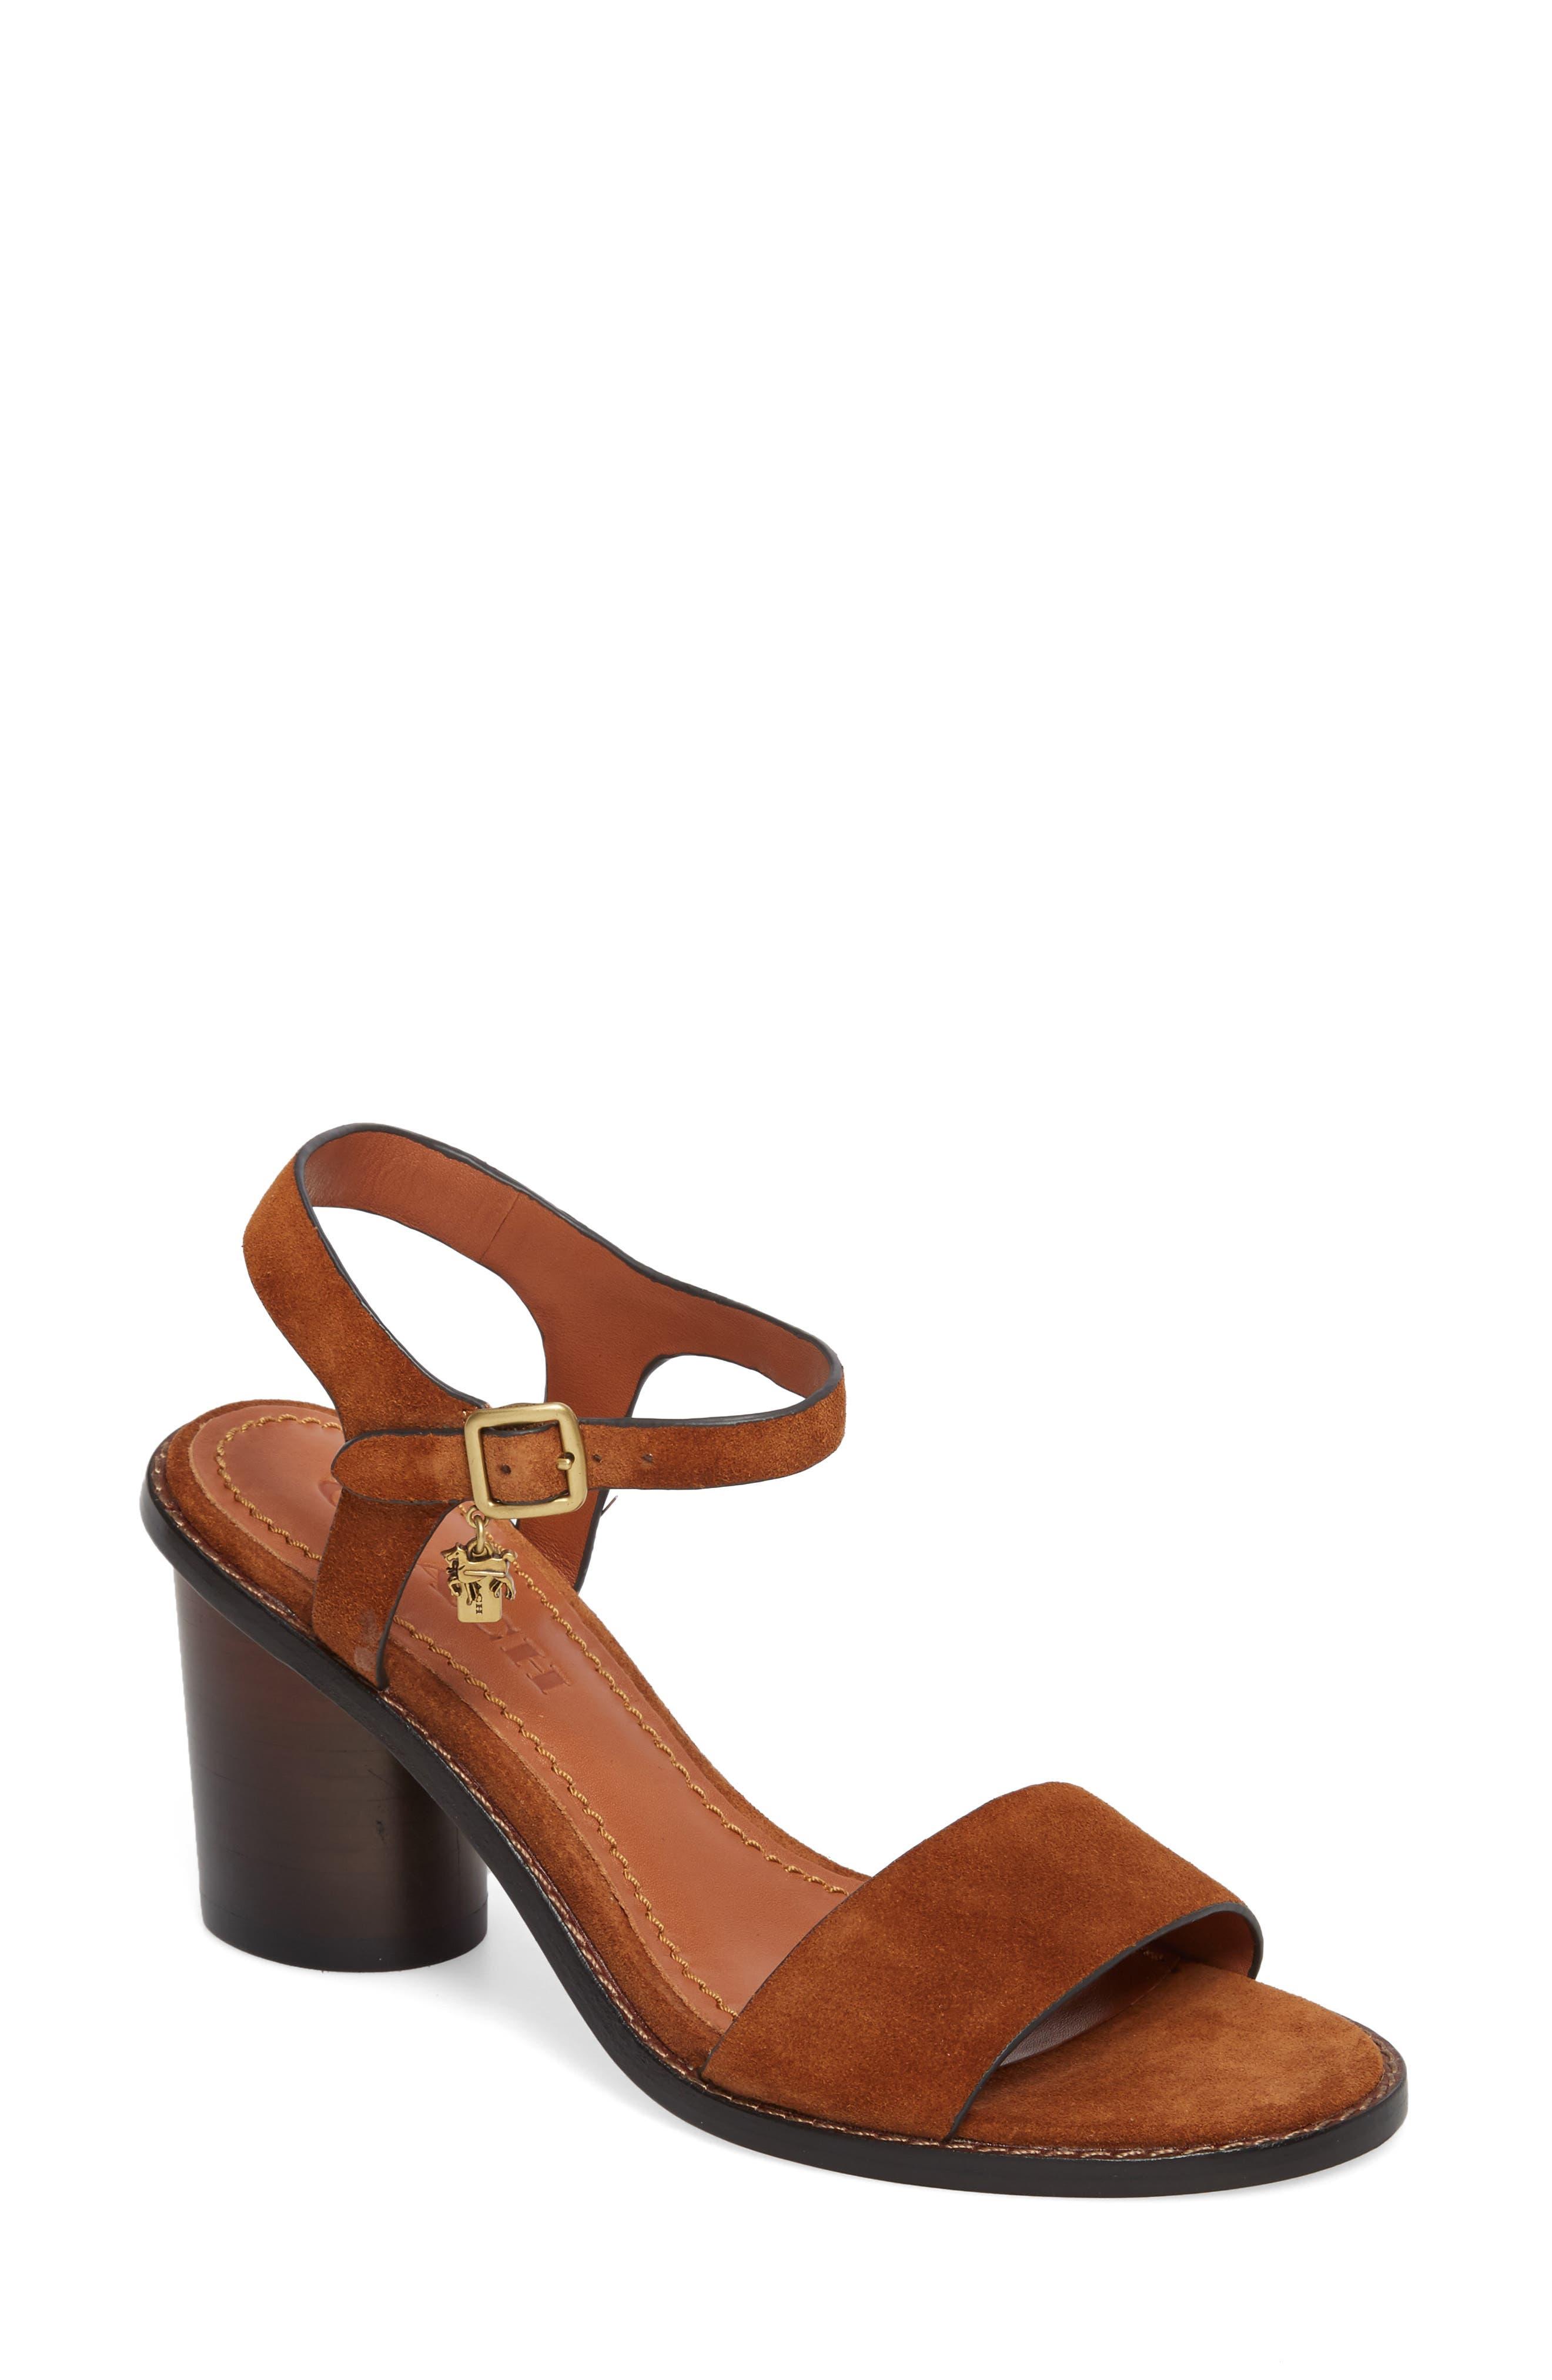 Column Heel Sandal,                         Main,                         color,